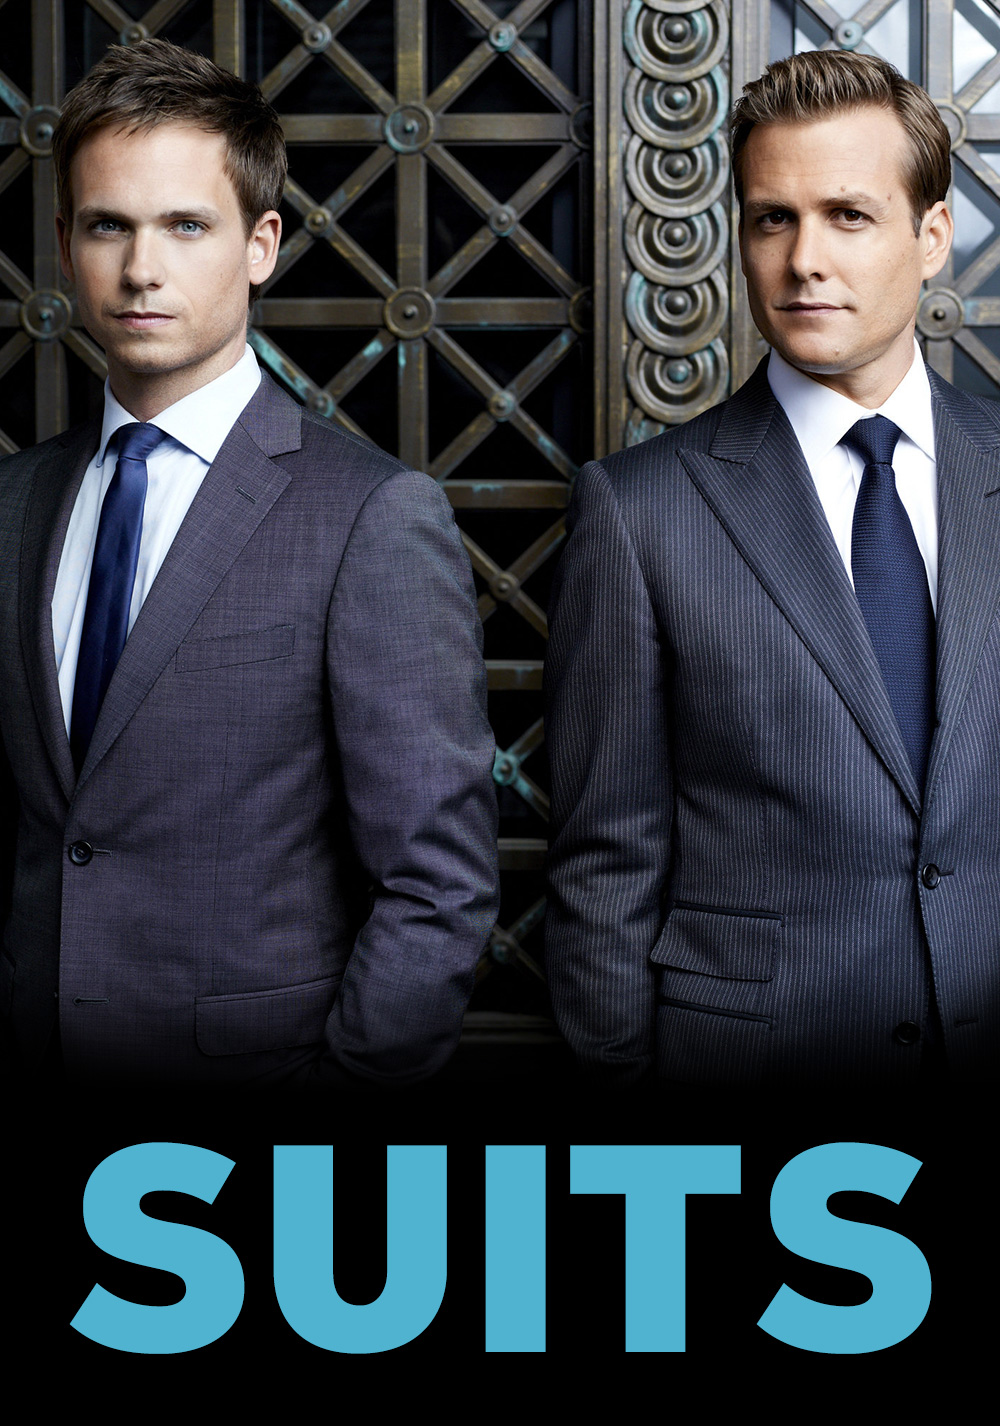 suits-52b60286a3ee1.jpg